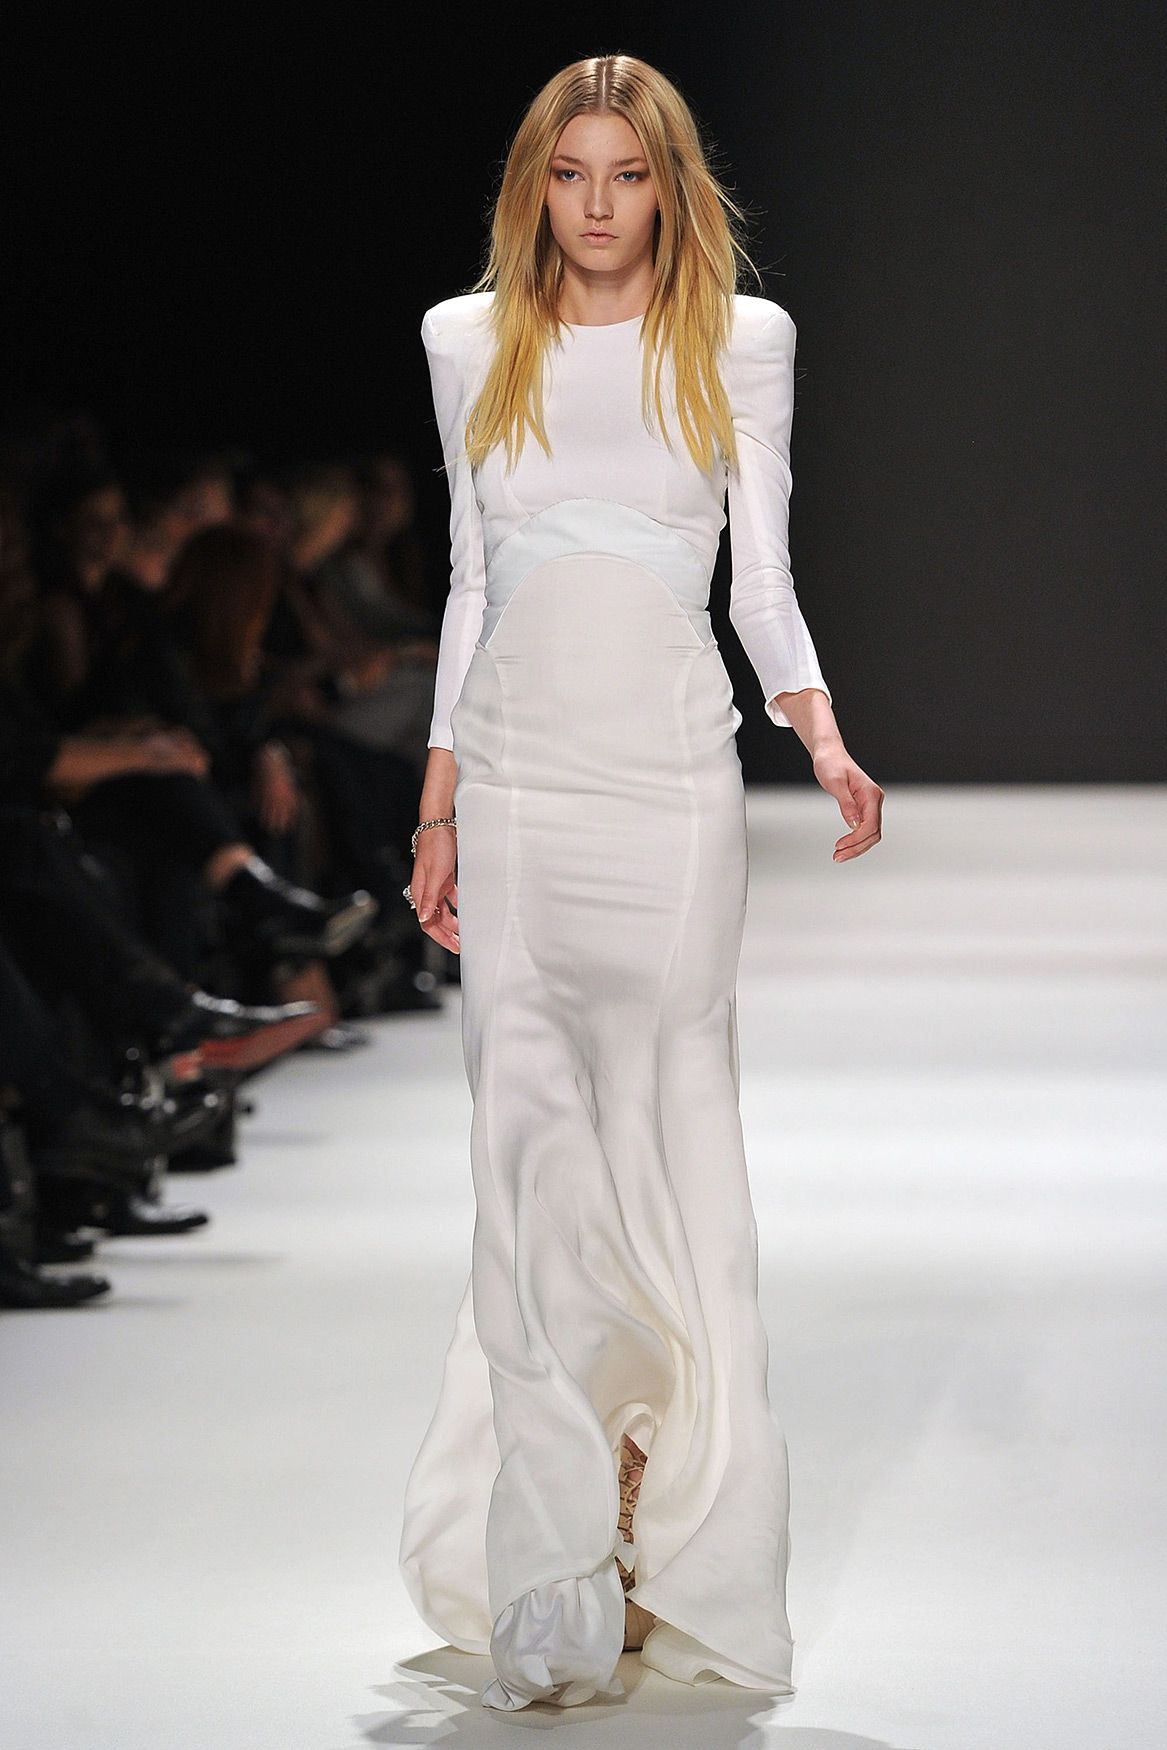 210eb1c39546 Victory Dress, kaviar gauche   dresses   Pinterest   Kaviar gauche ...